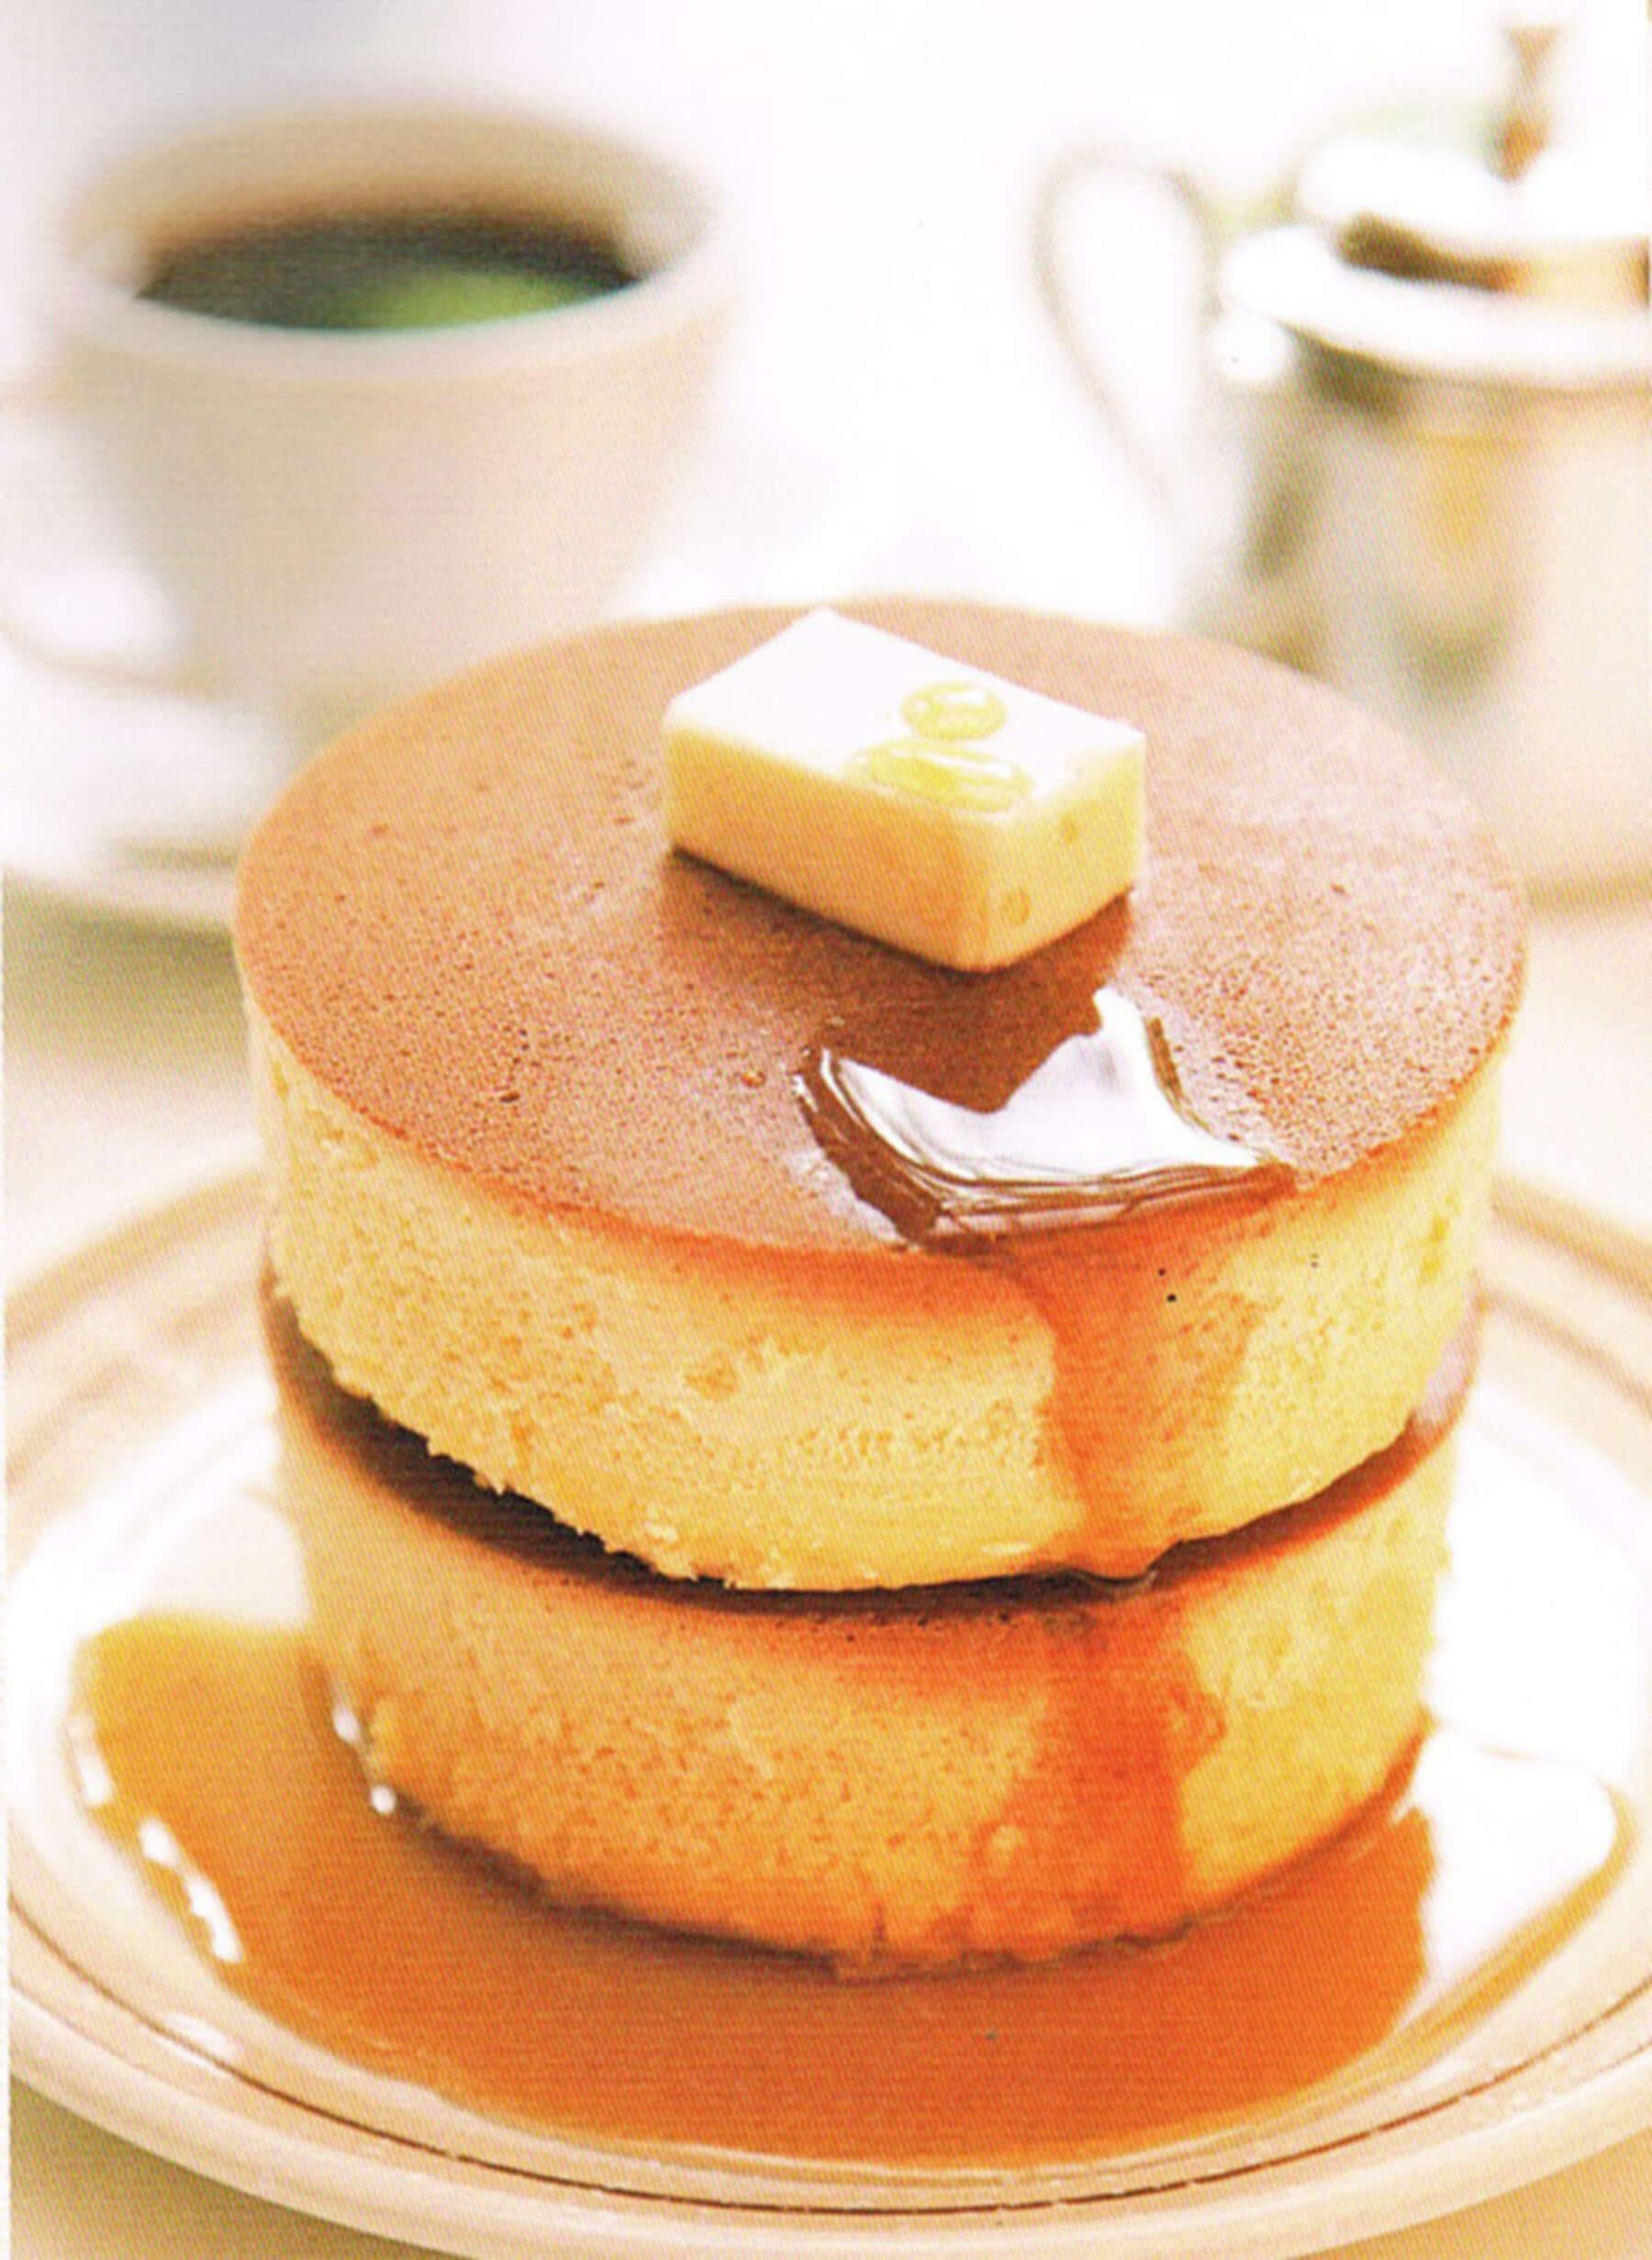 Japanese Fluffy Pancakes  Fluffy Japanese Pancakes